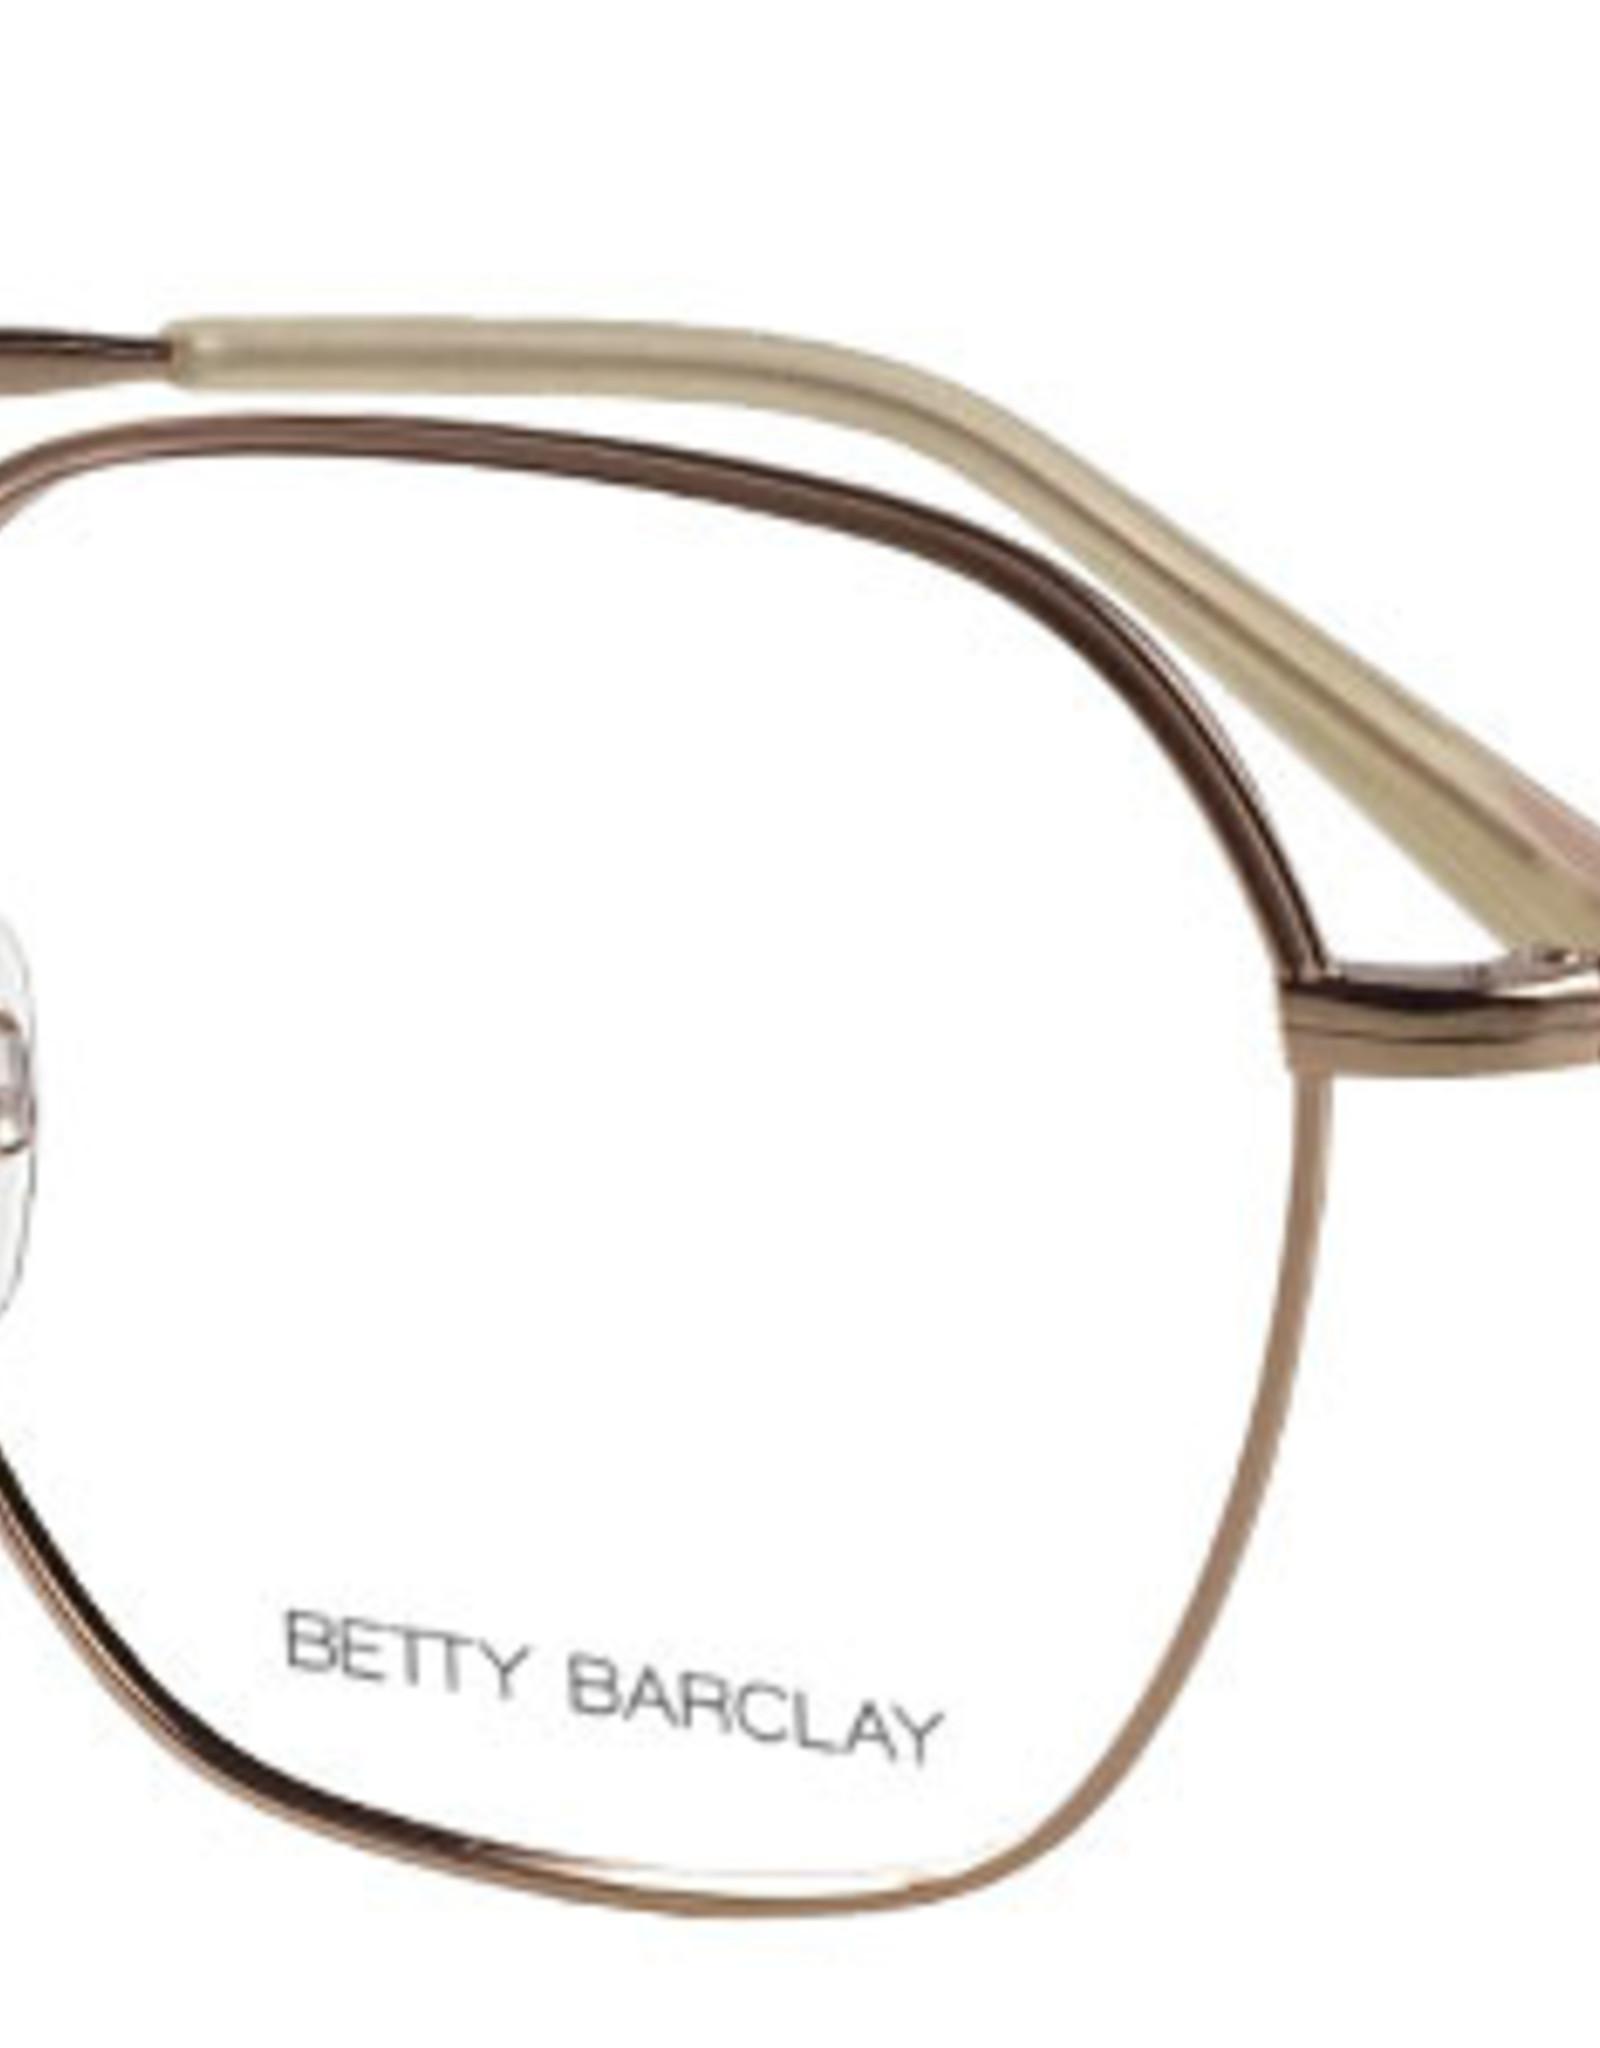 Betty Barclay Berkeley 522581 Black Silver